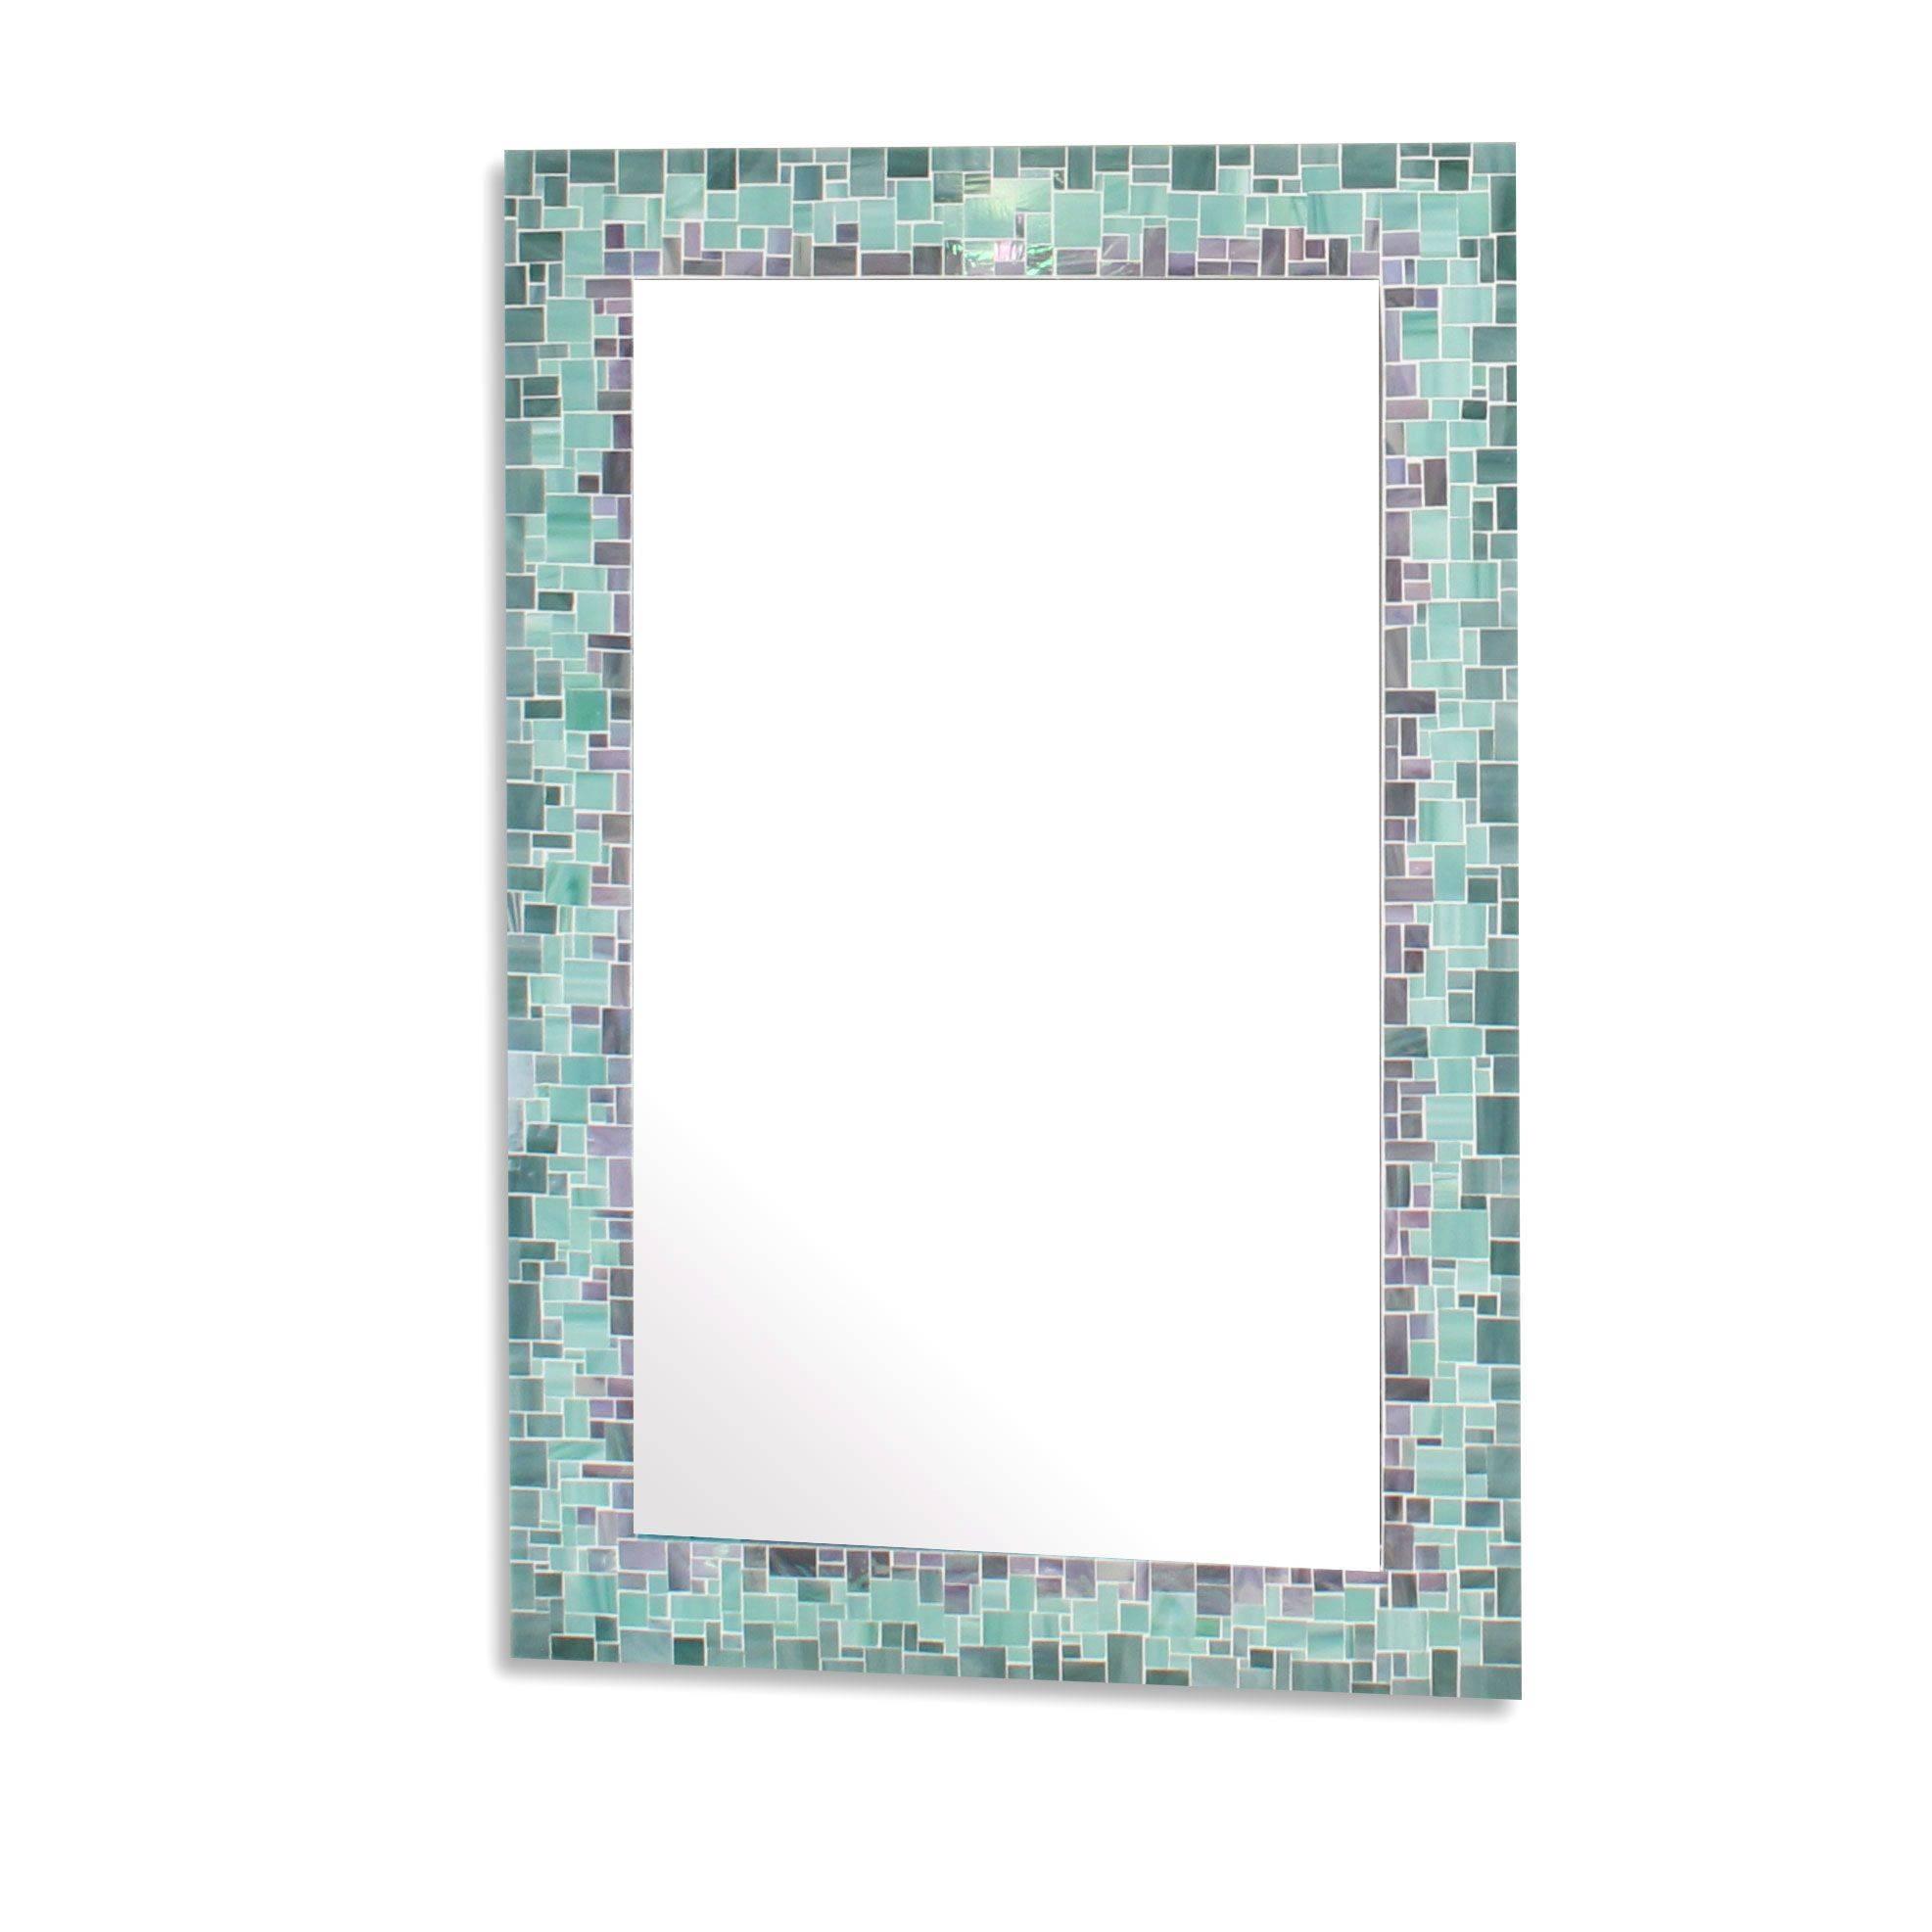 Buy Handmade Sunburst Decorative Mosaic Wall Mirror In Iridescent throughout Mosaic Wall Mirrors (Image 8 of 25)